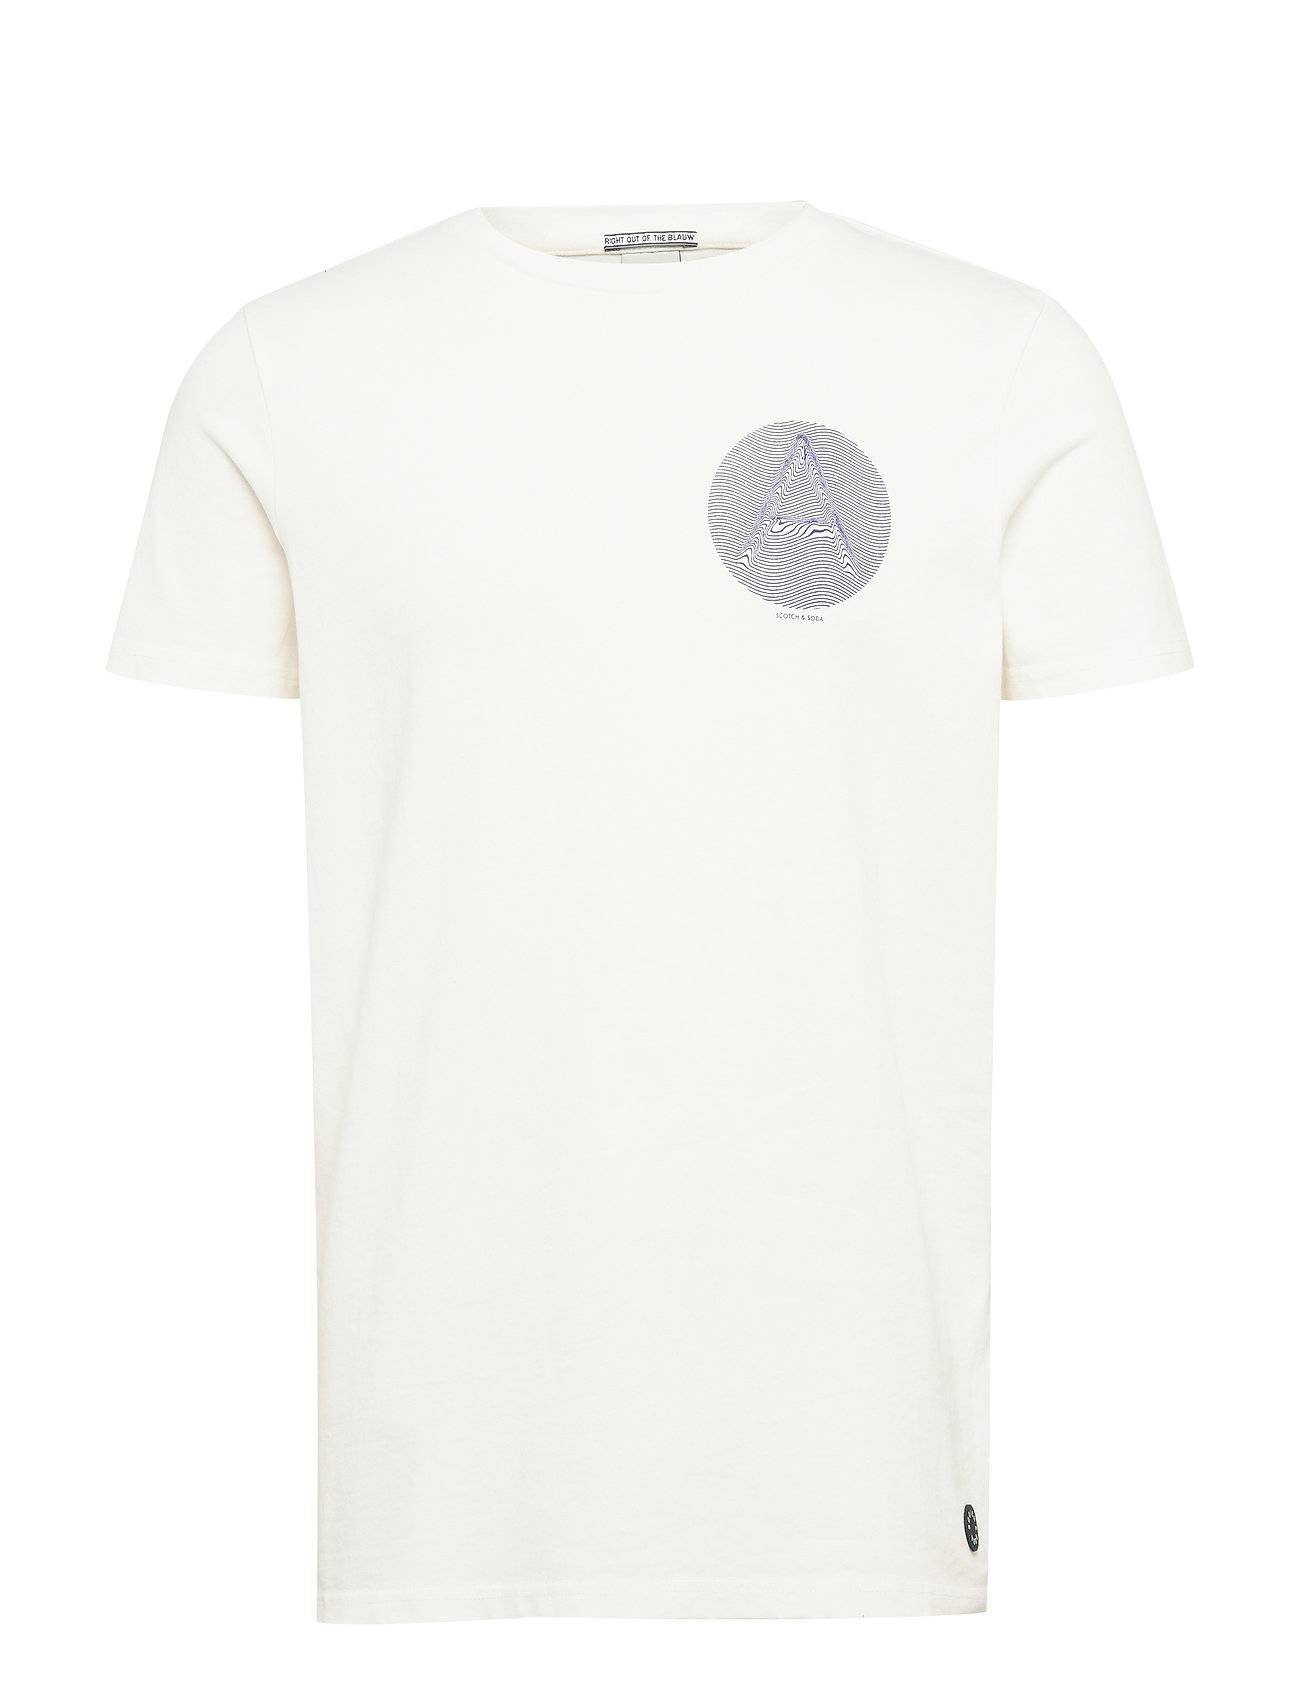 Image of Scotch & Soda Ams Blauw Washed Rocker Tee With Seasonal Artworks T-shirts Short-sleeved Valkoinen Scotch & Soda